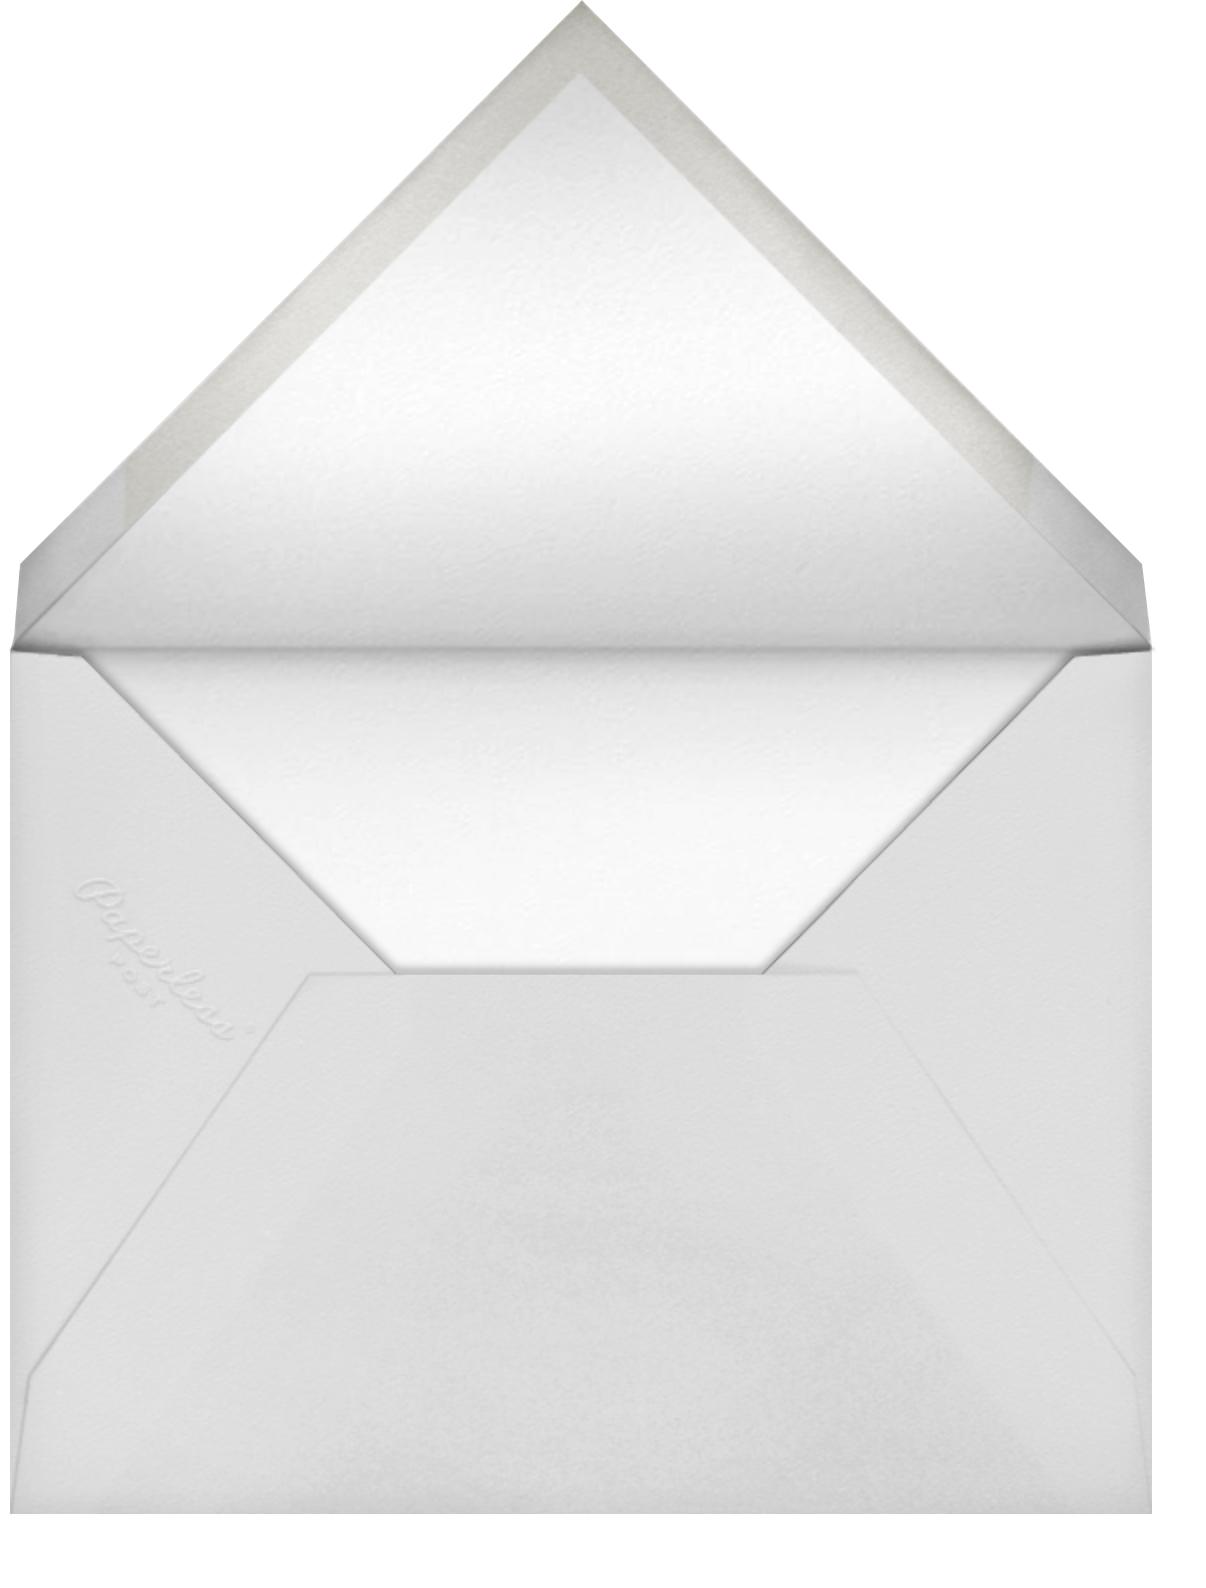 Fleurs d'Alençon - Antwerp - Oscar de la Renta - Wedding brunch - envelope back